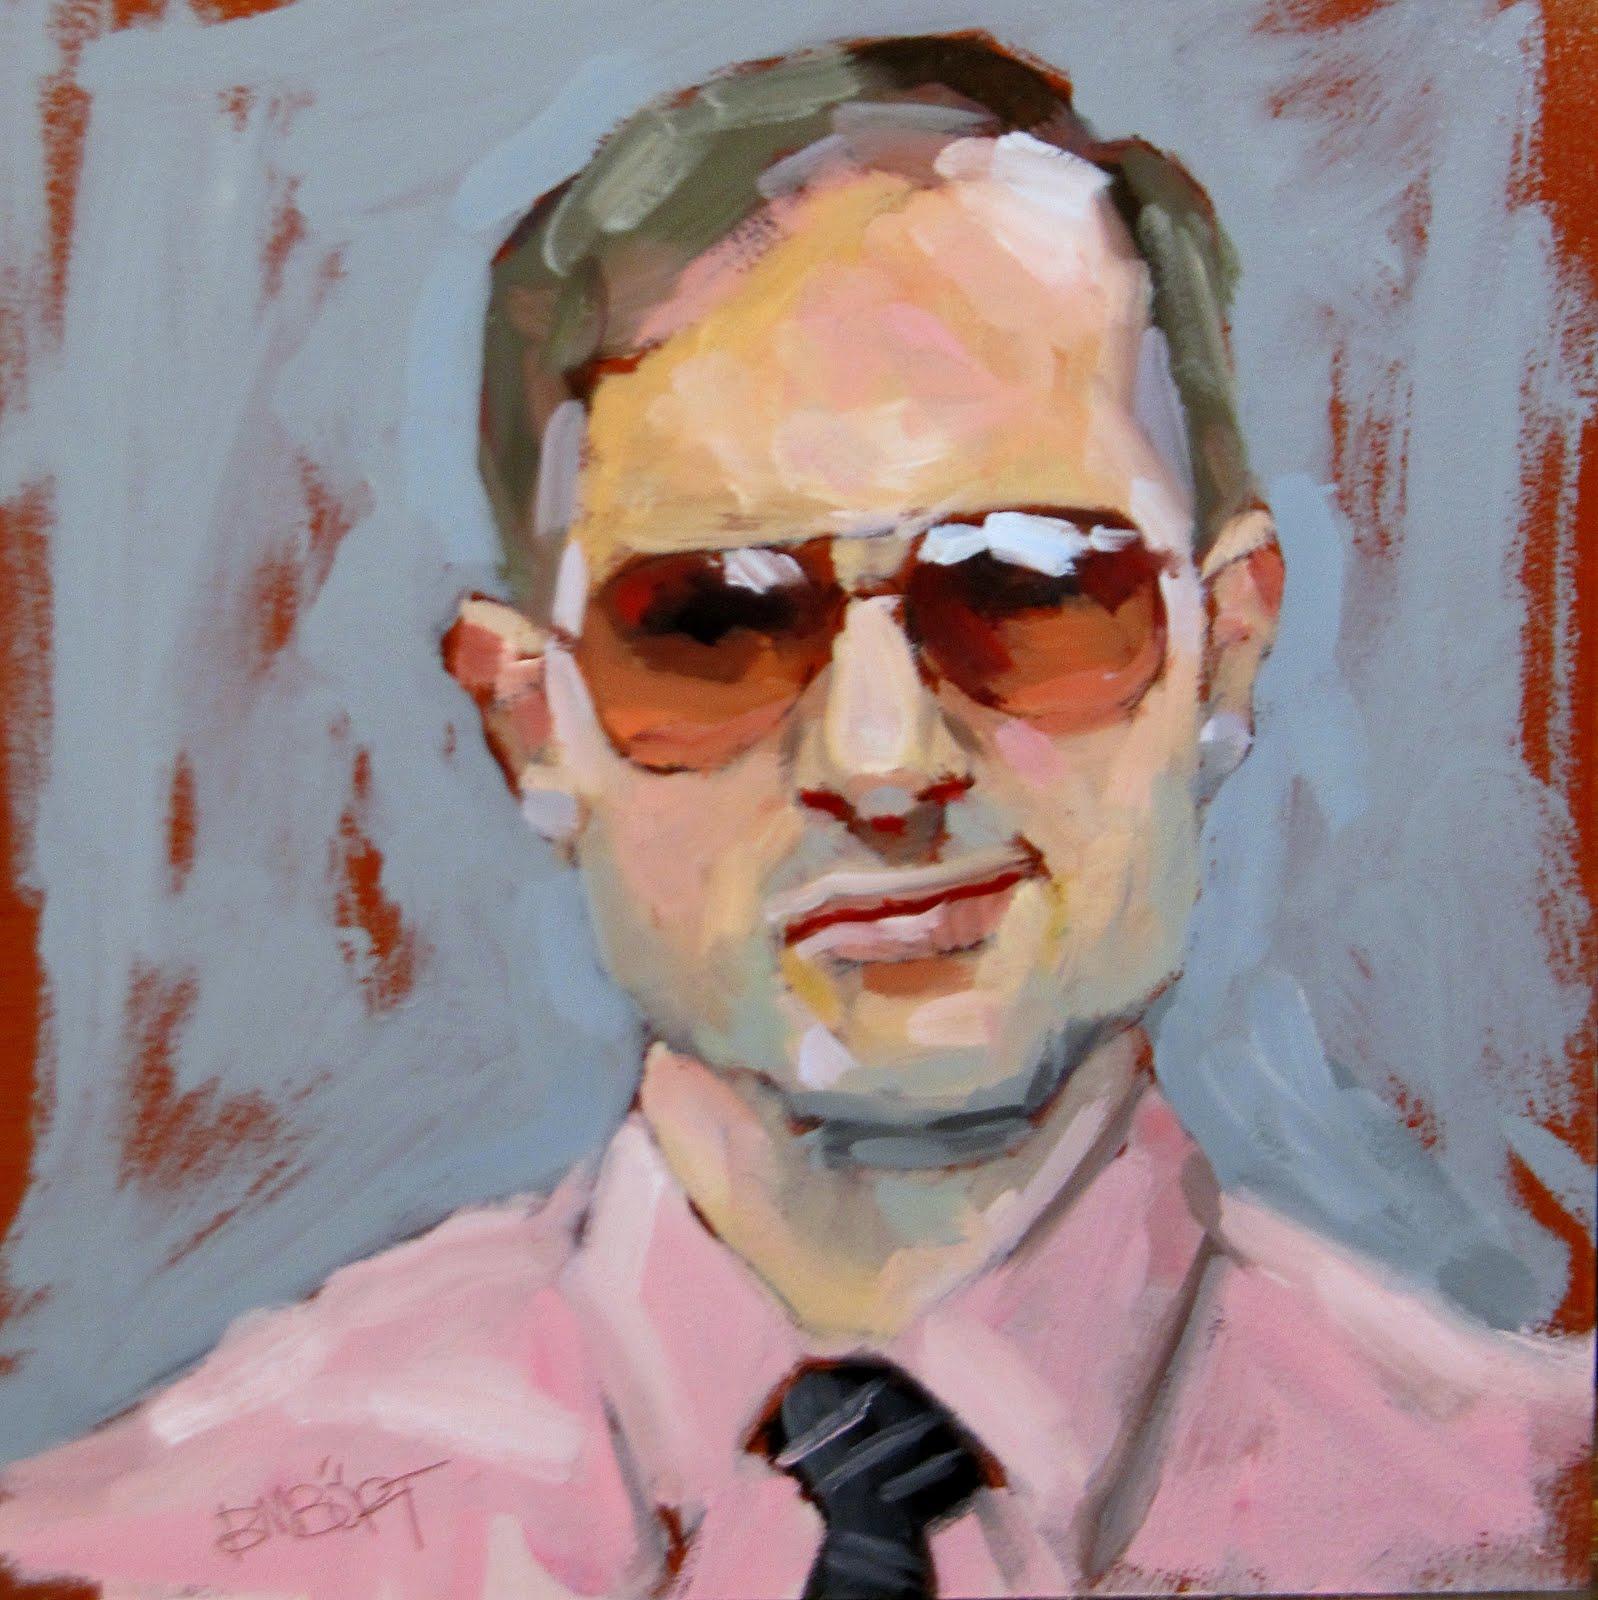 """ART 4 DIAPERS (DAILY DIAPER #179) Cocky"" original fine art by Brian Burt"